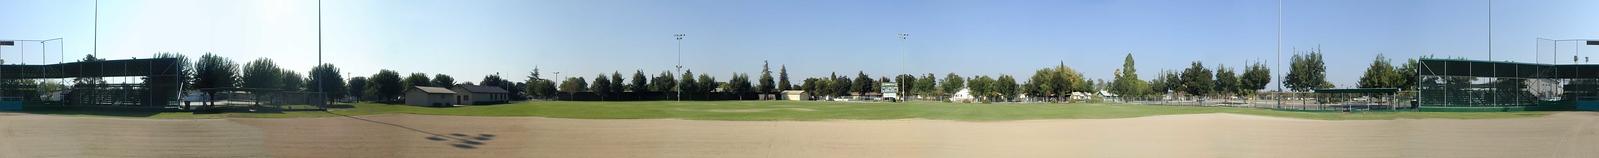 Kerckhoff Park